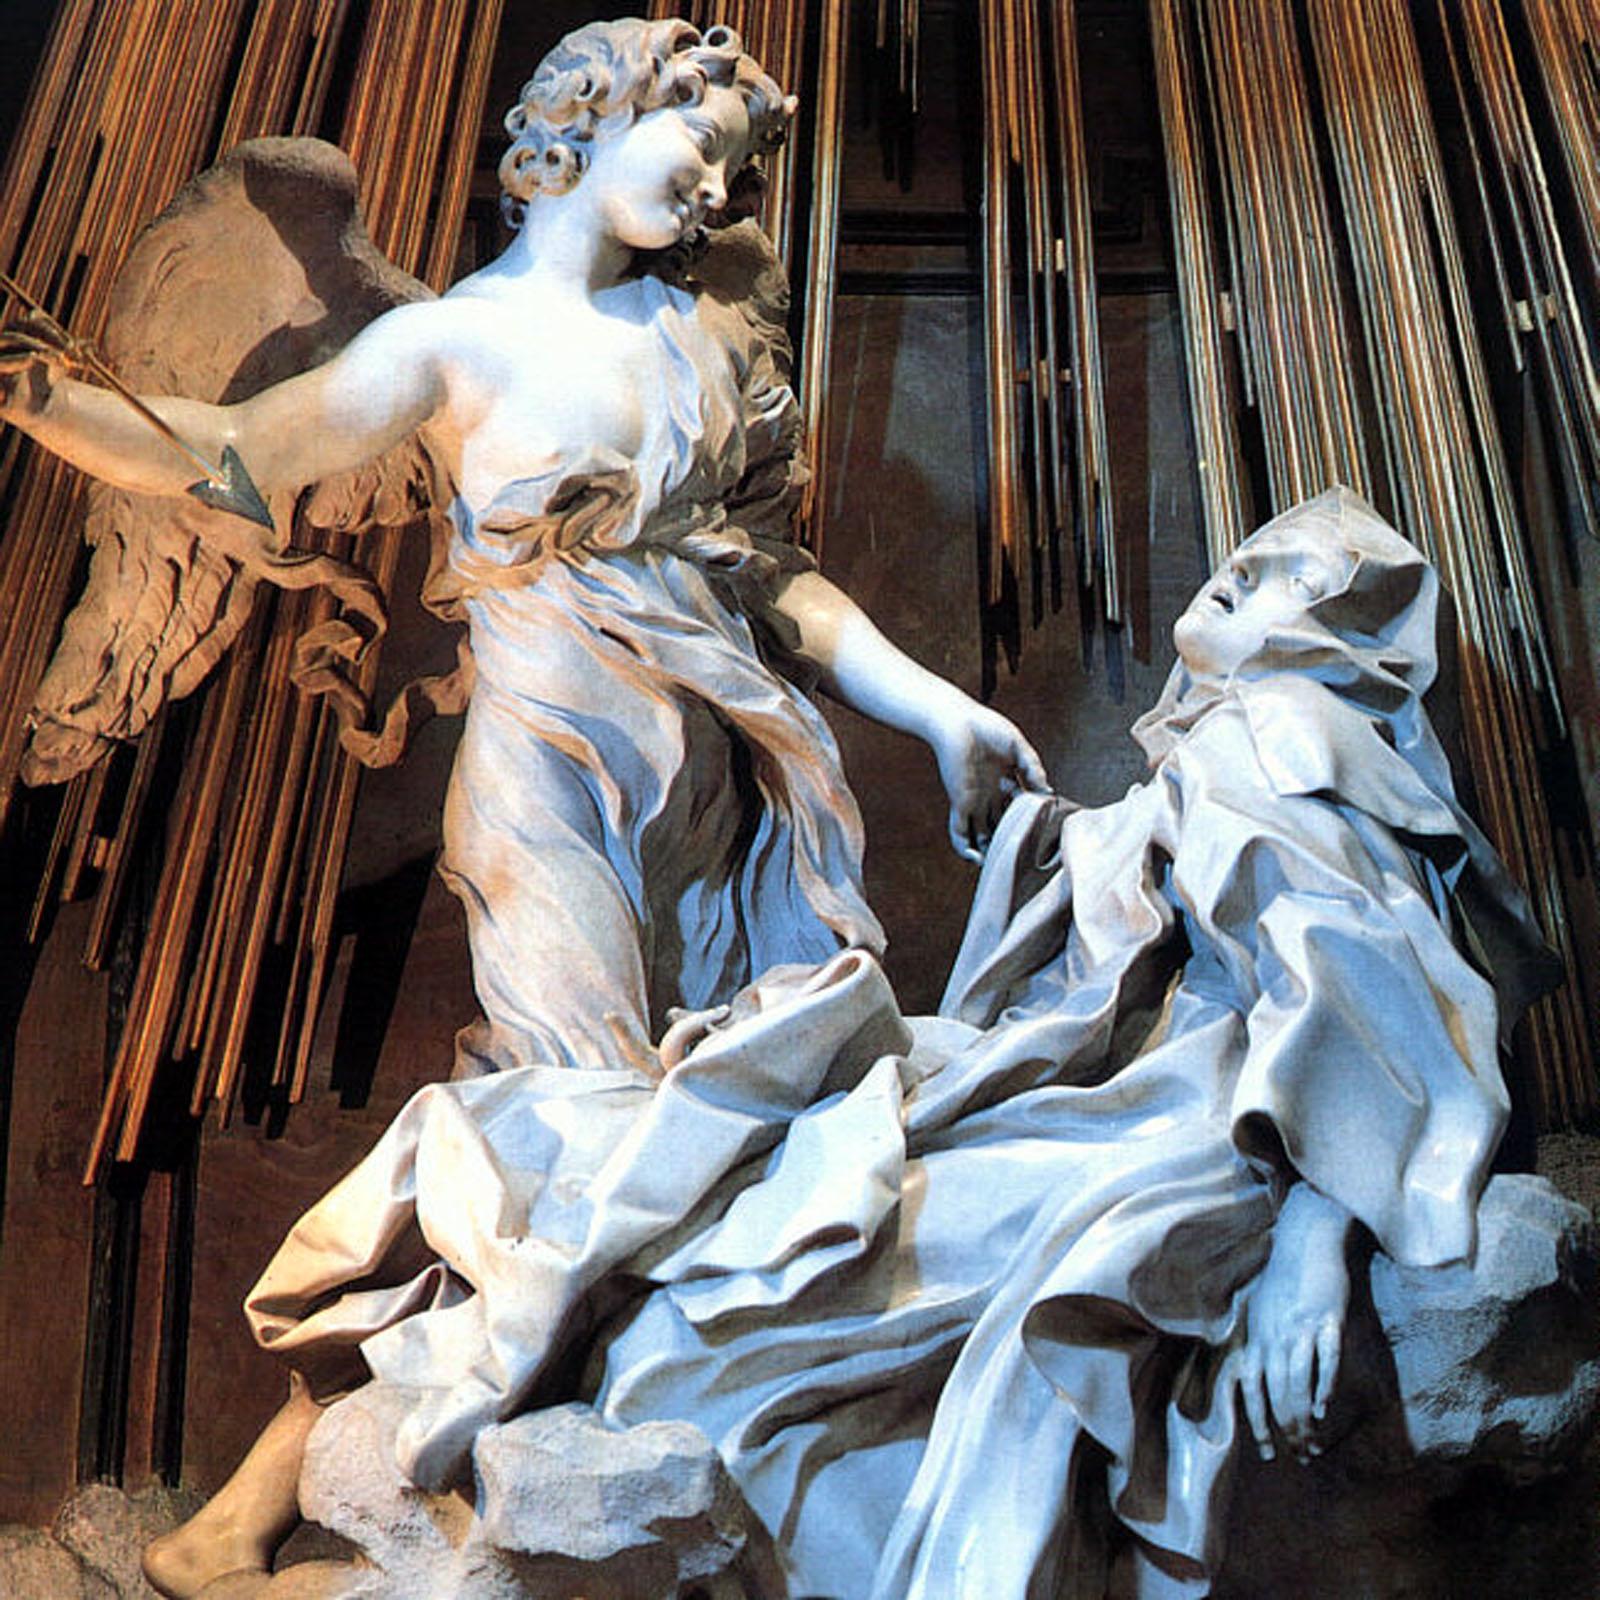 St. Teresa of Avila sculpture in Santa Maria della Vittoria, Rome